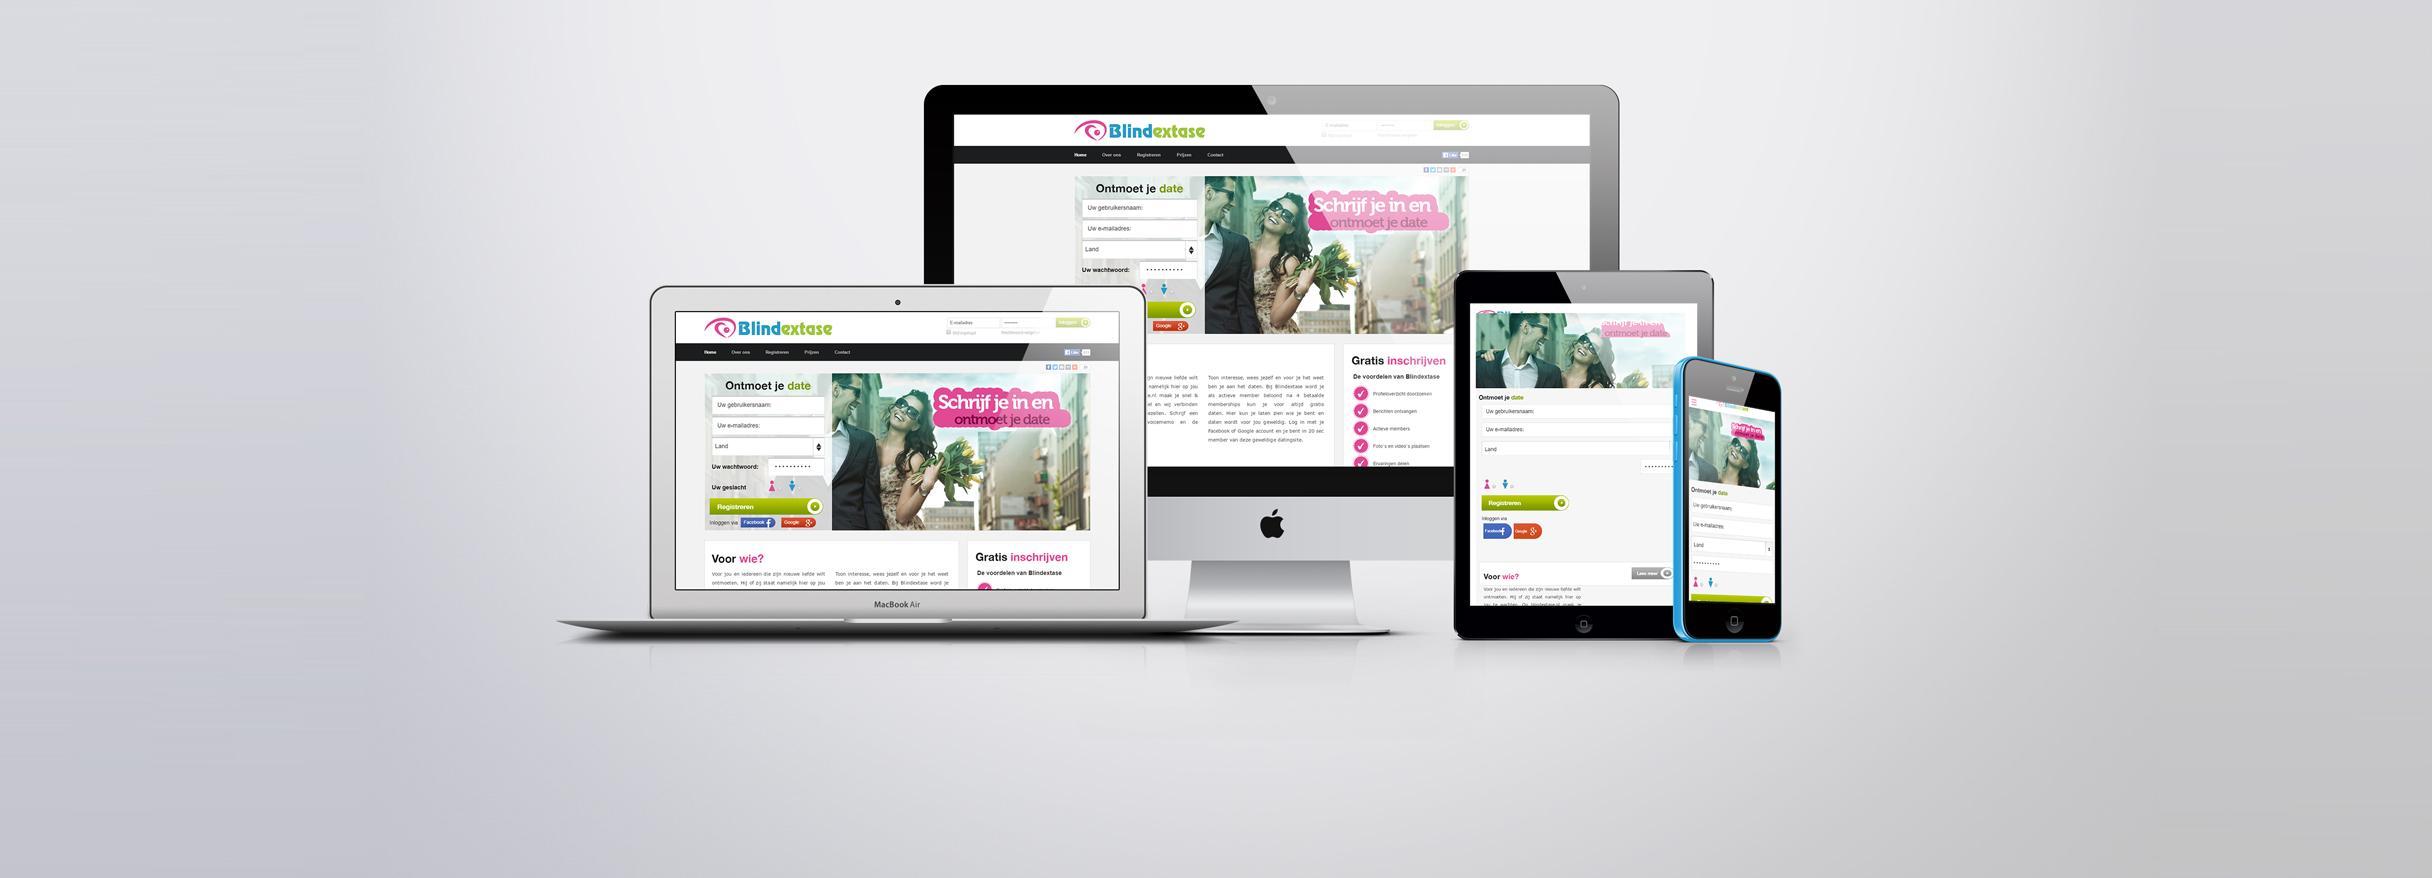 Datingwebsite